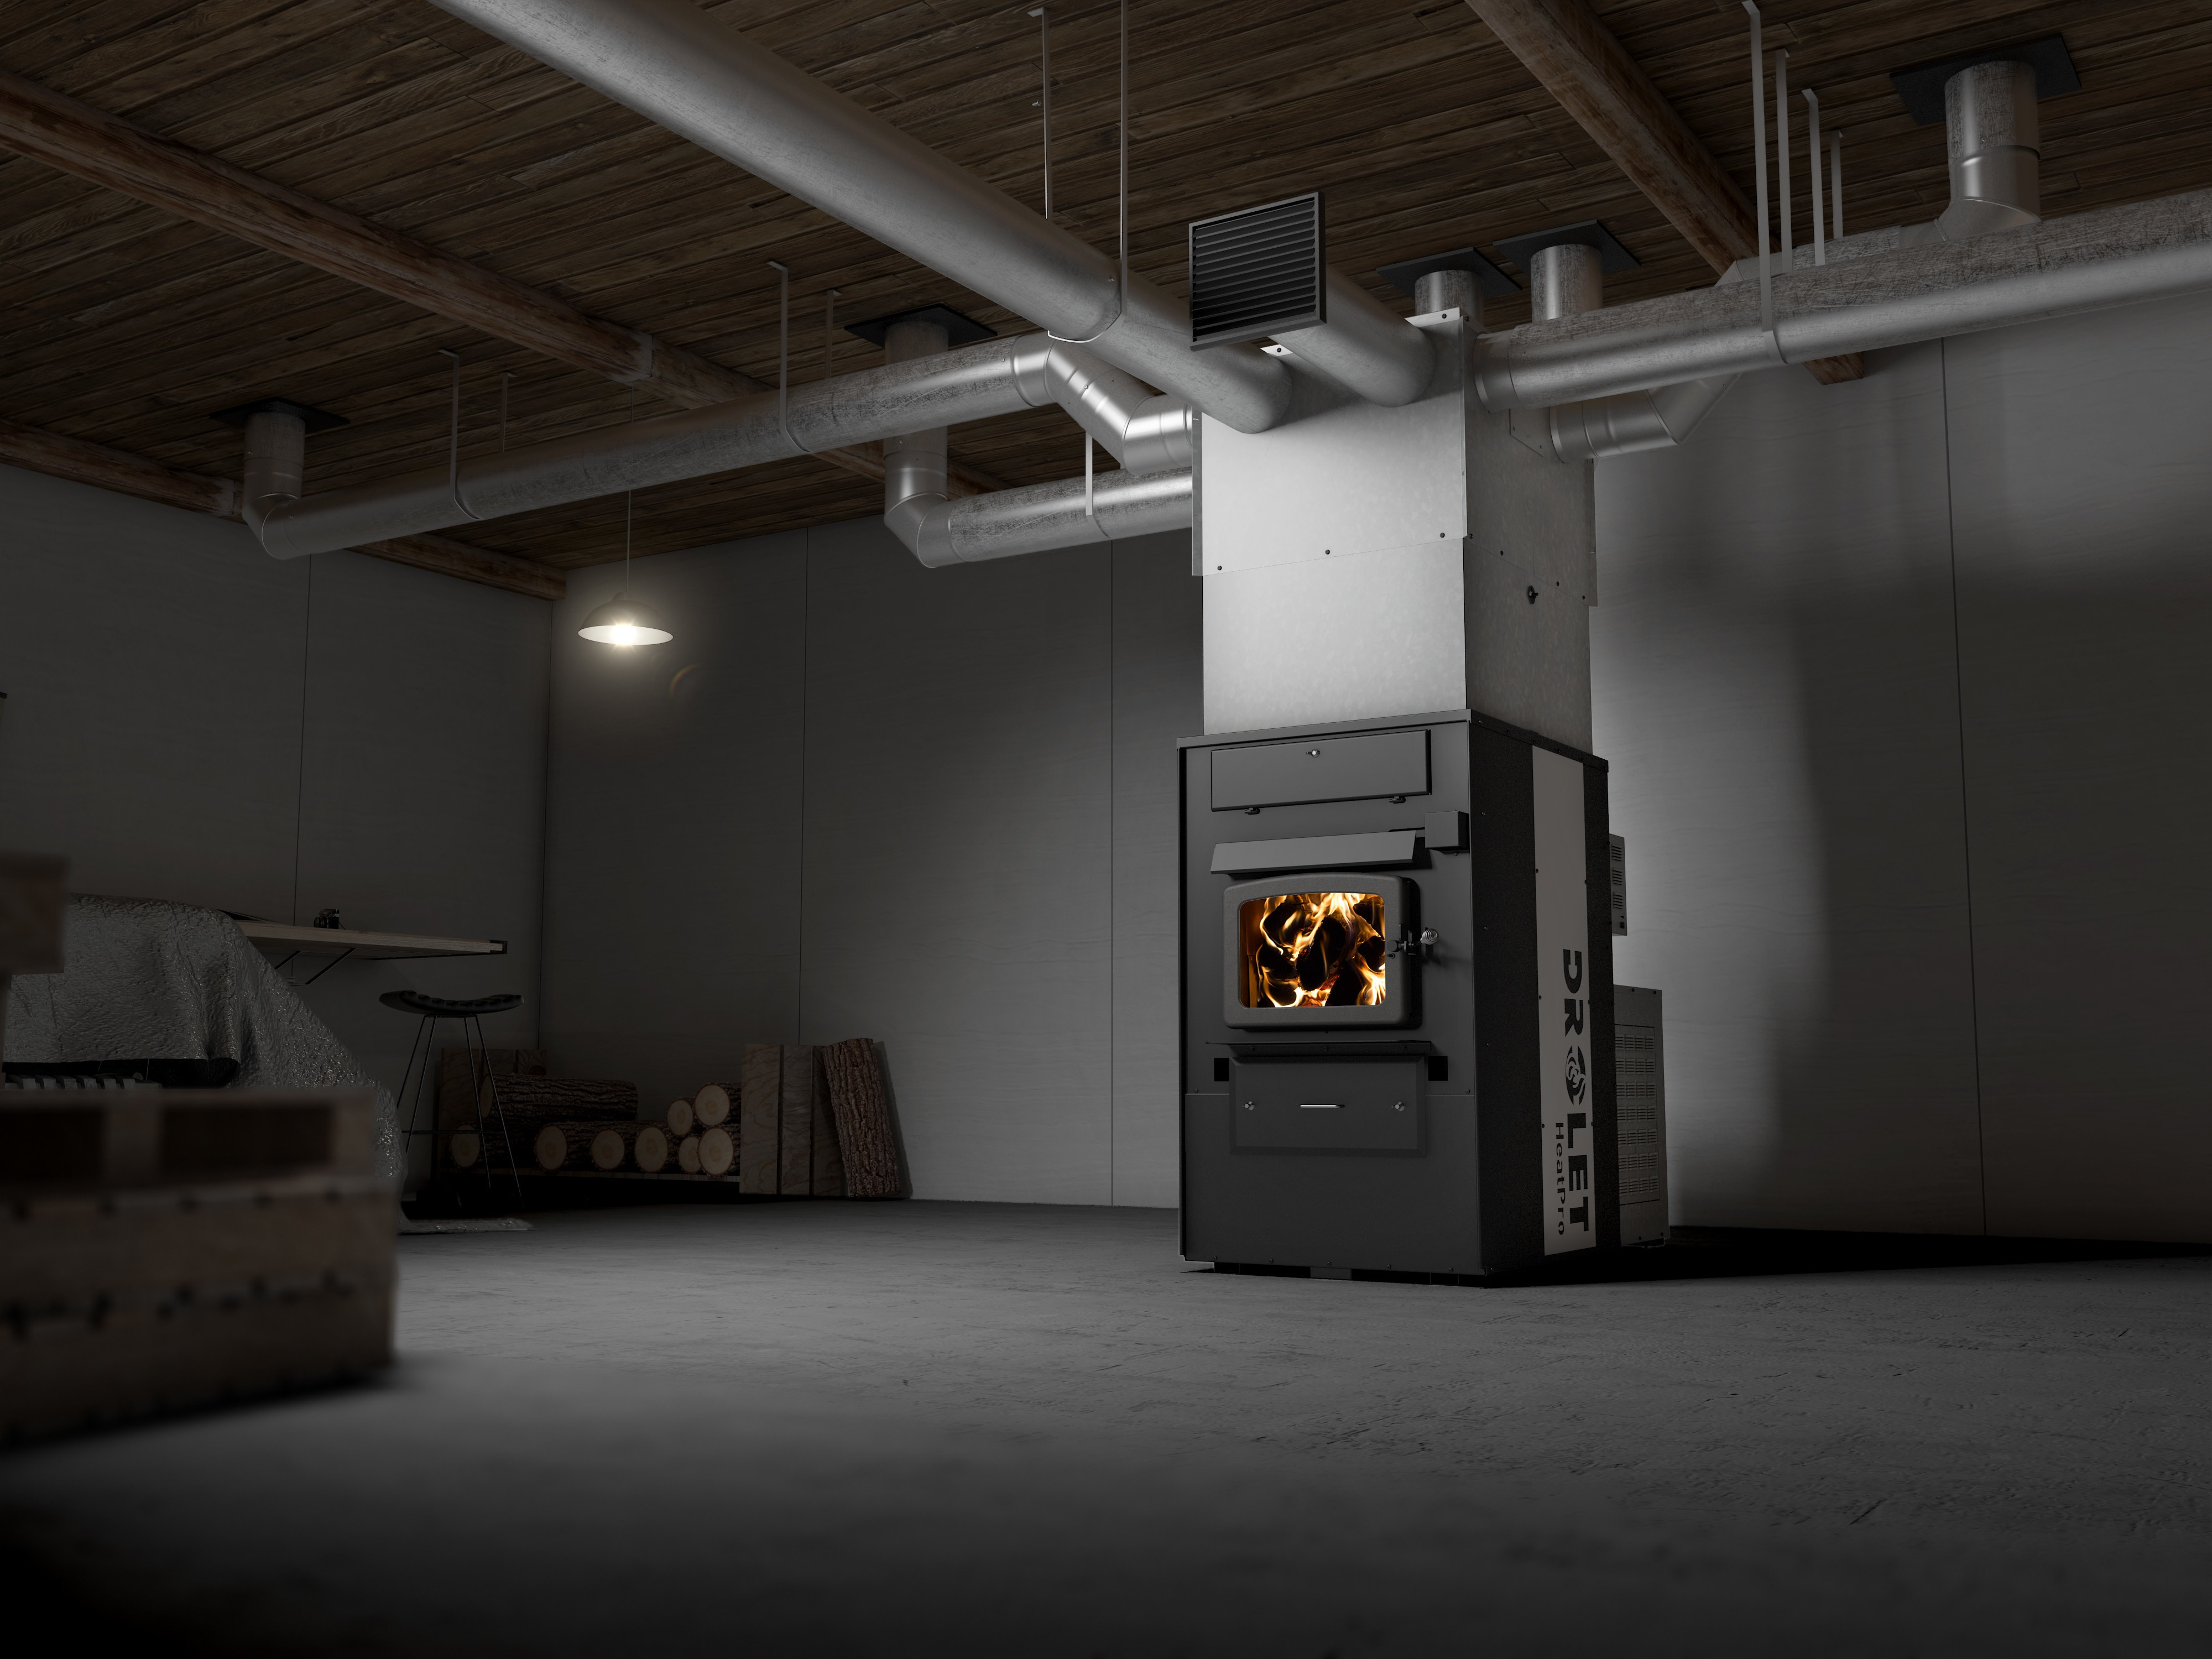 Drolet HeatPro Drolet wood furnace HeatPro / Wood furnace / Large ...